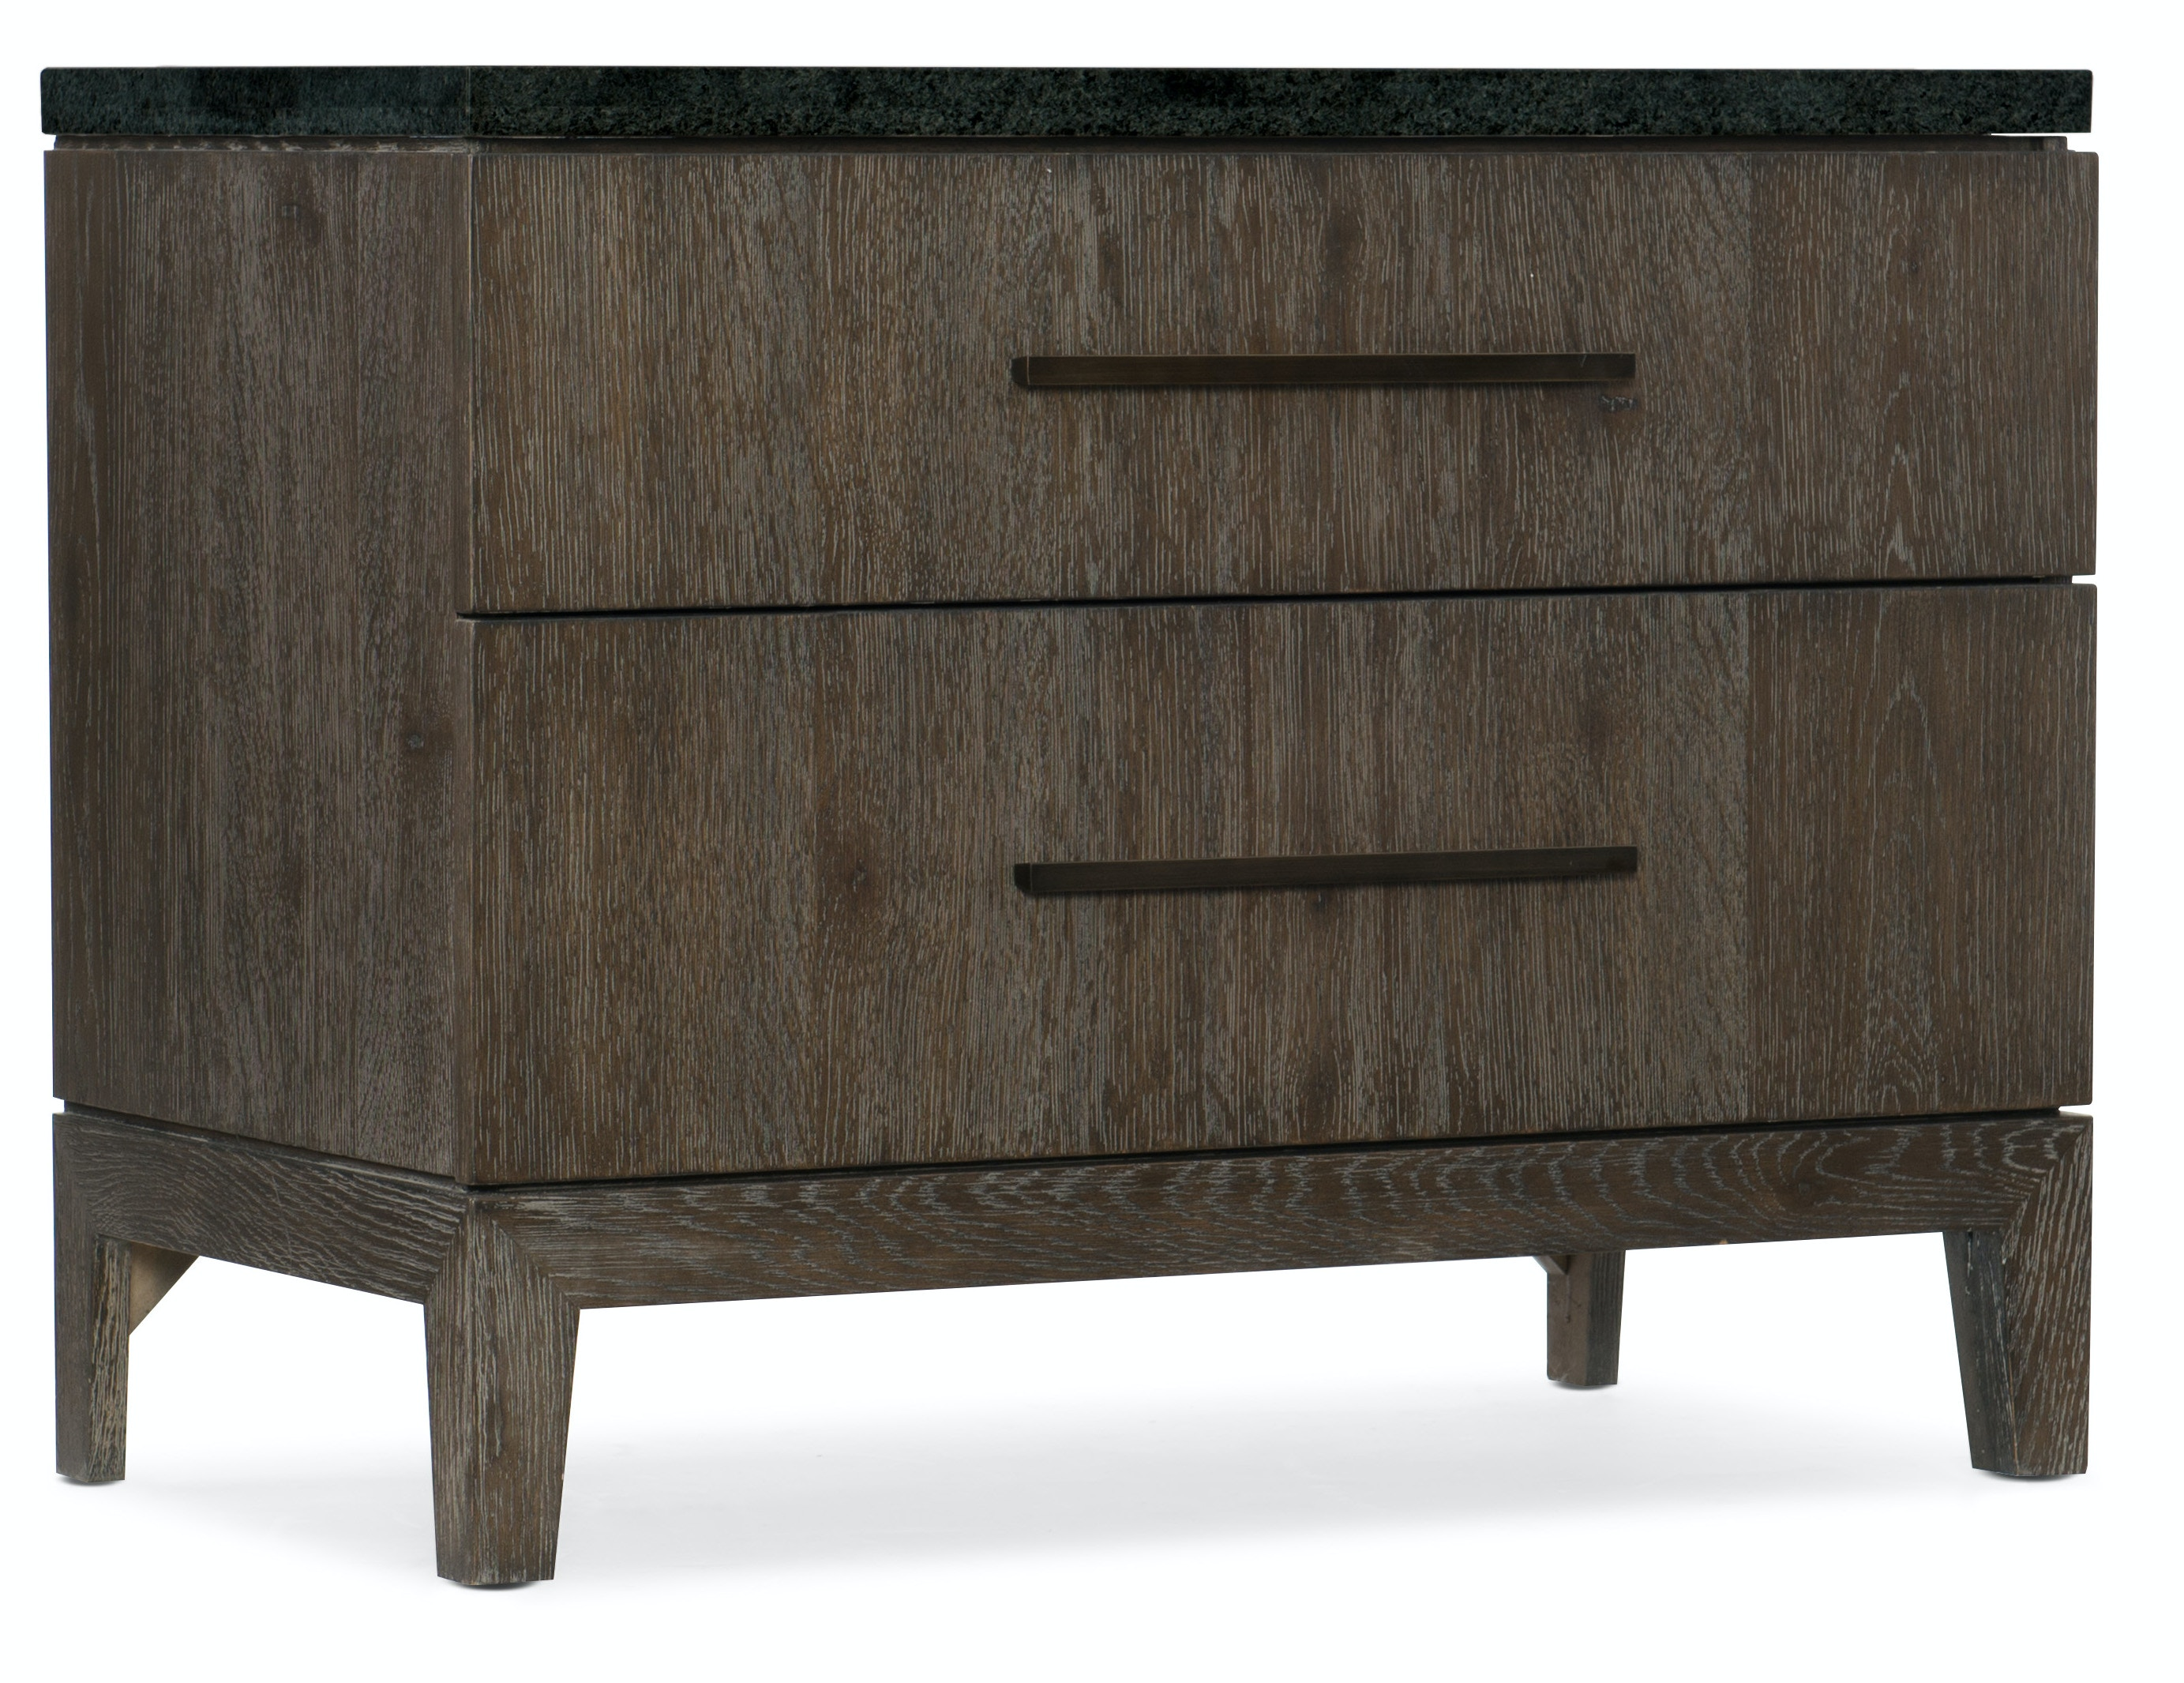 Hooker Furniture Miramar Aventura San Marcos Stone Top Nightstand  6202 90015 DKW